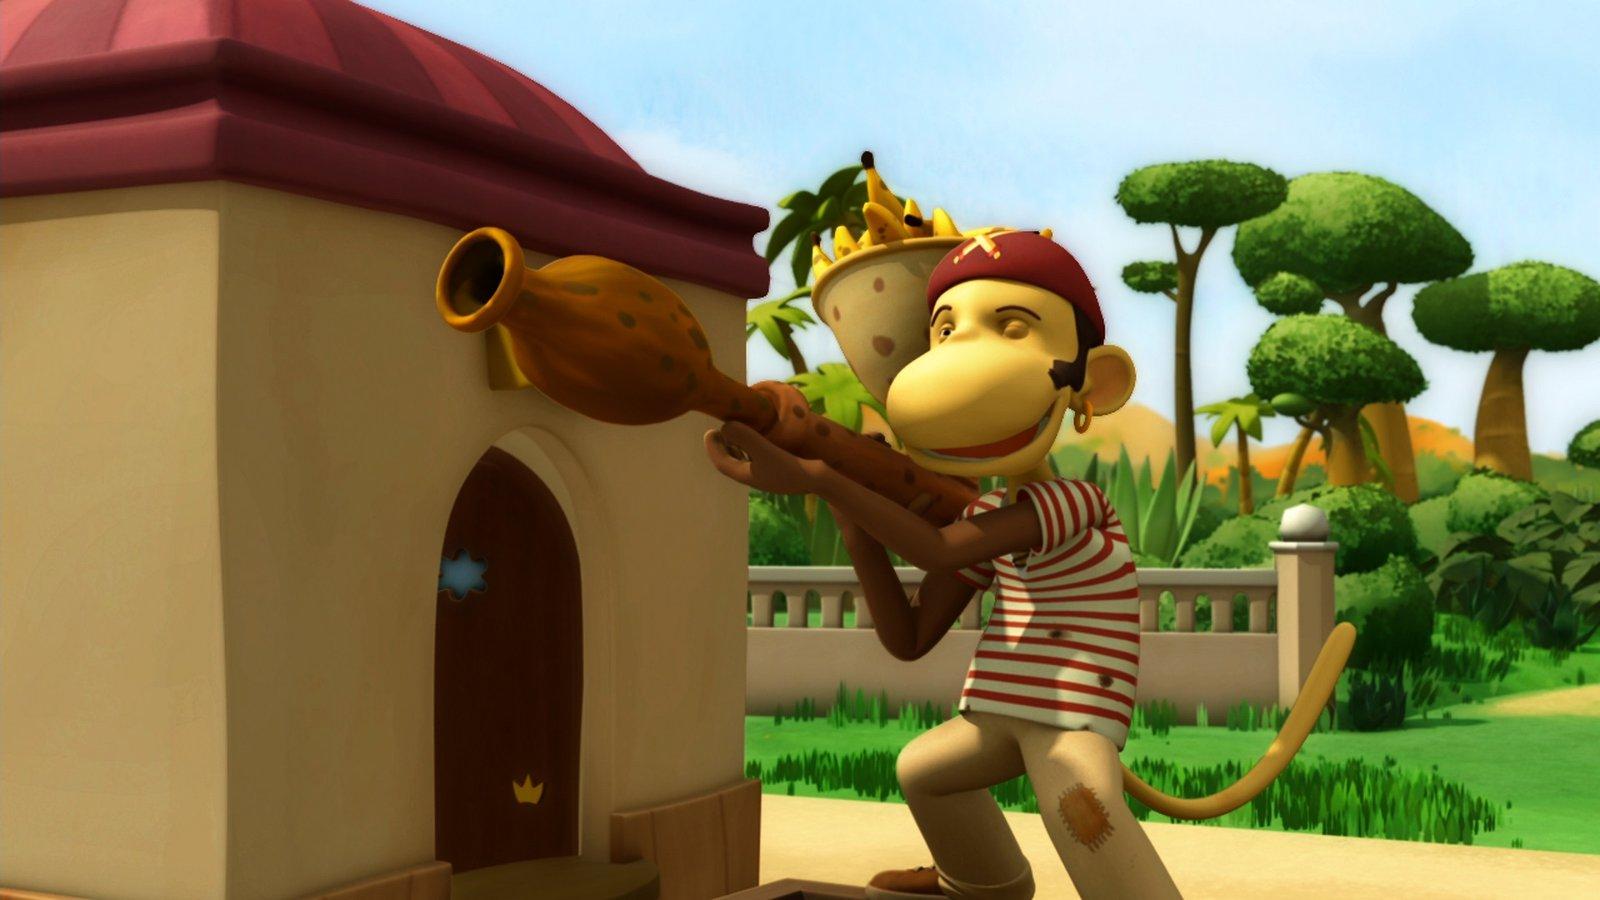 King Badou Vs The Pirates, Parts 1 & 2